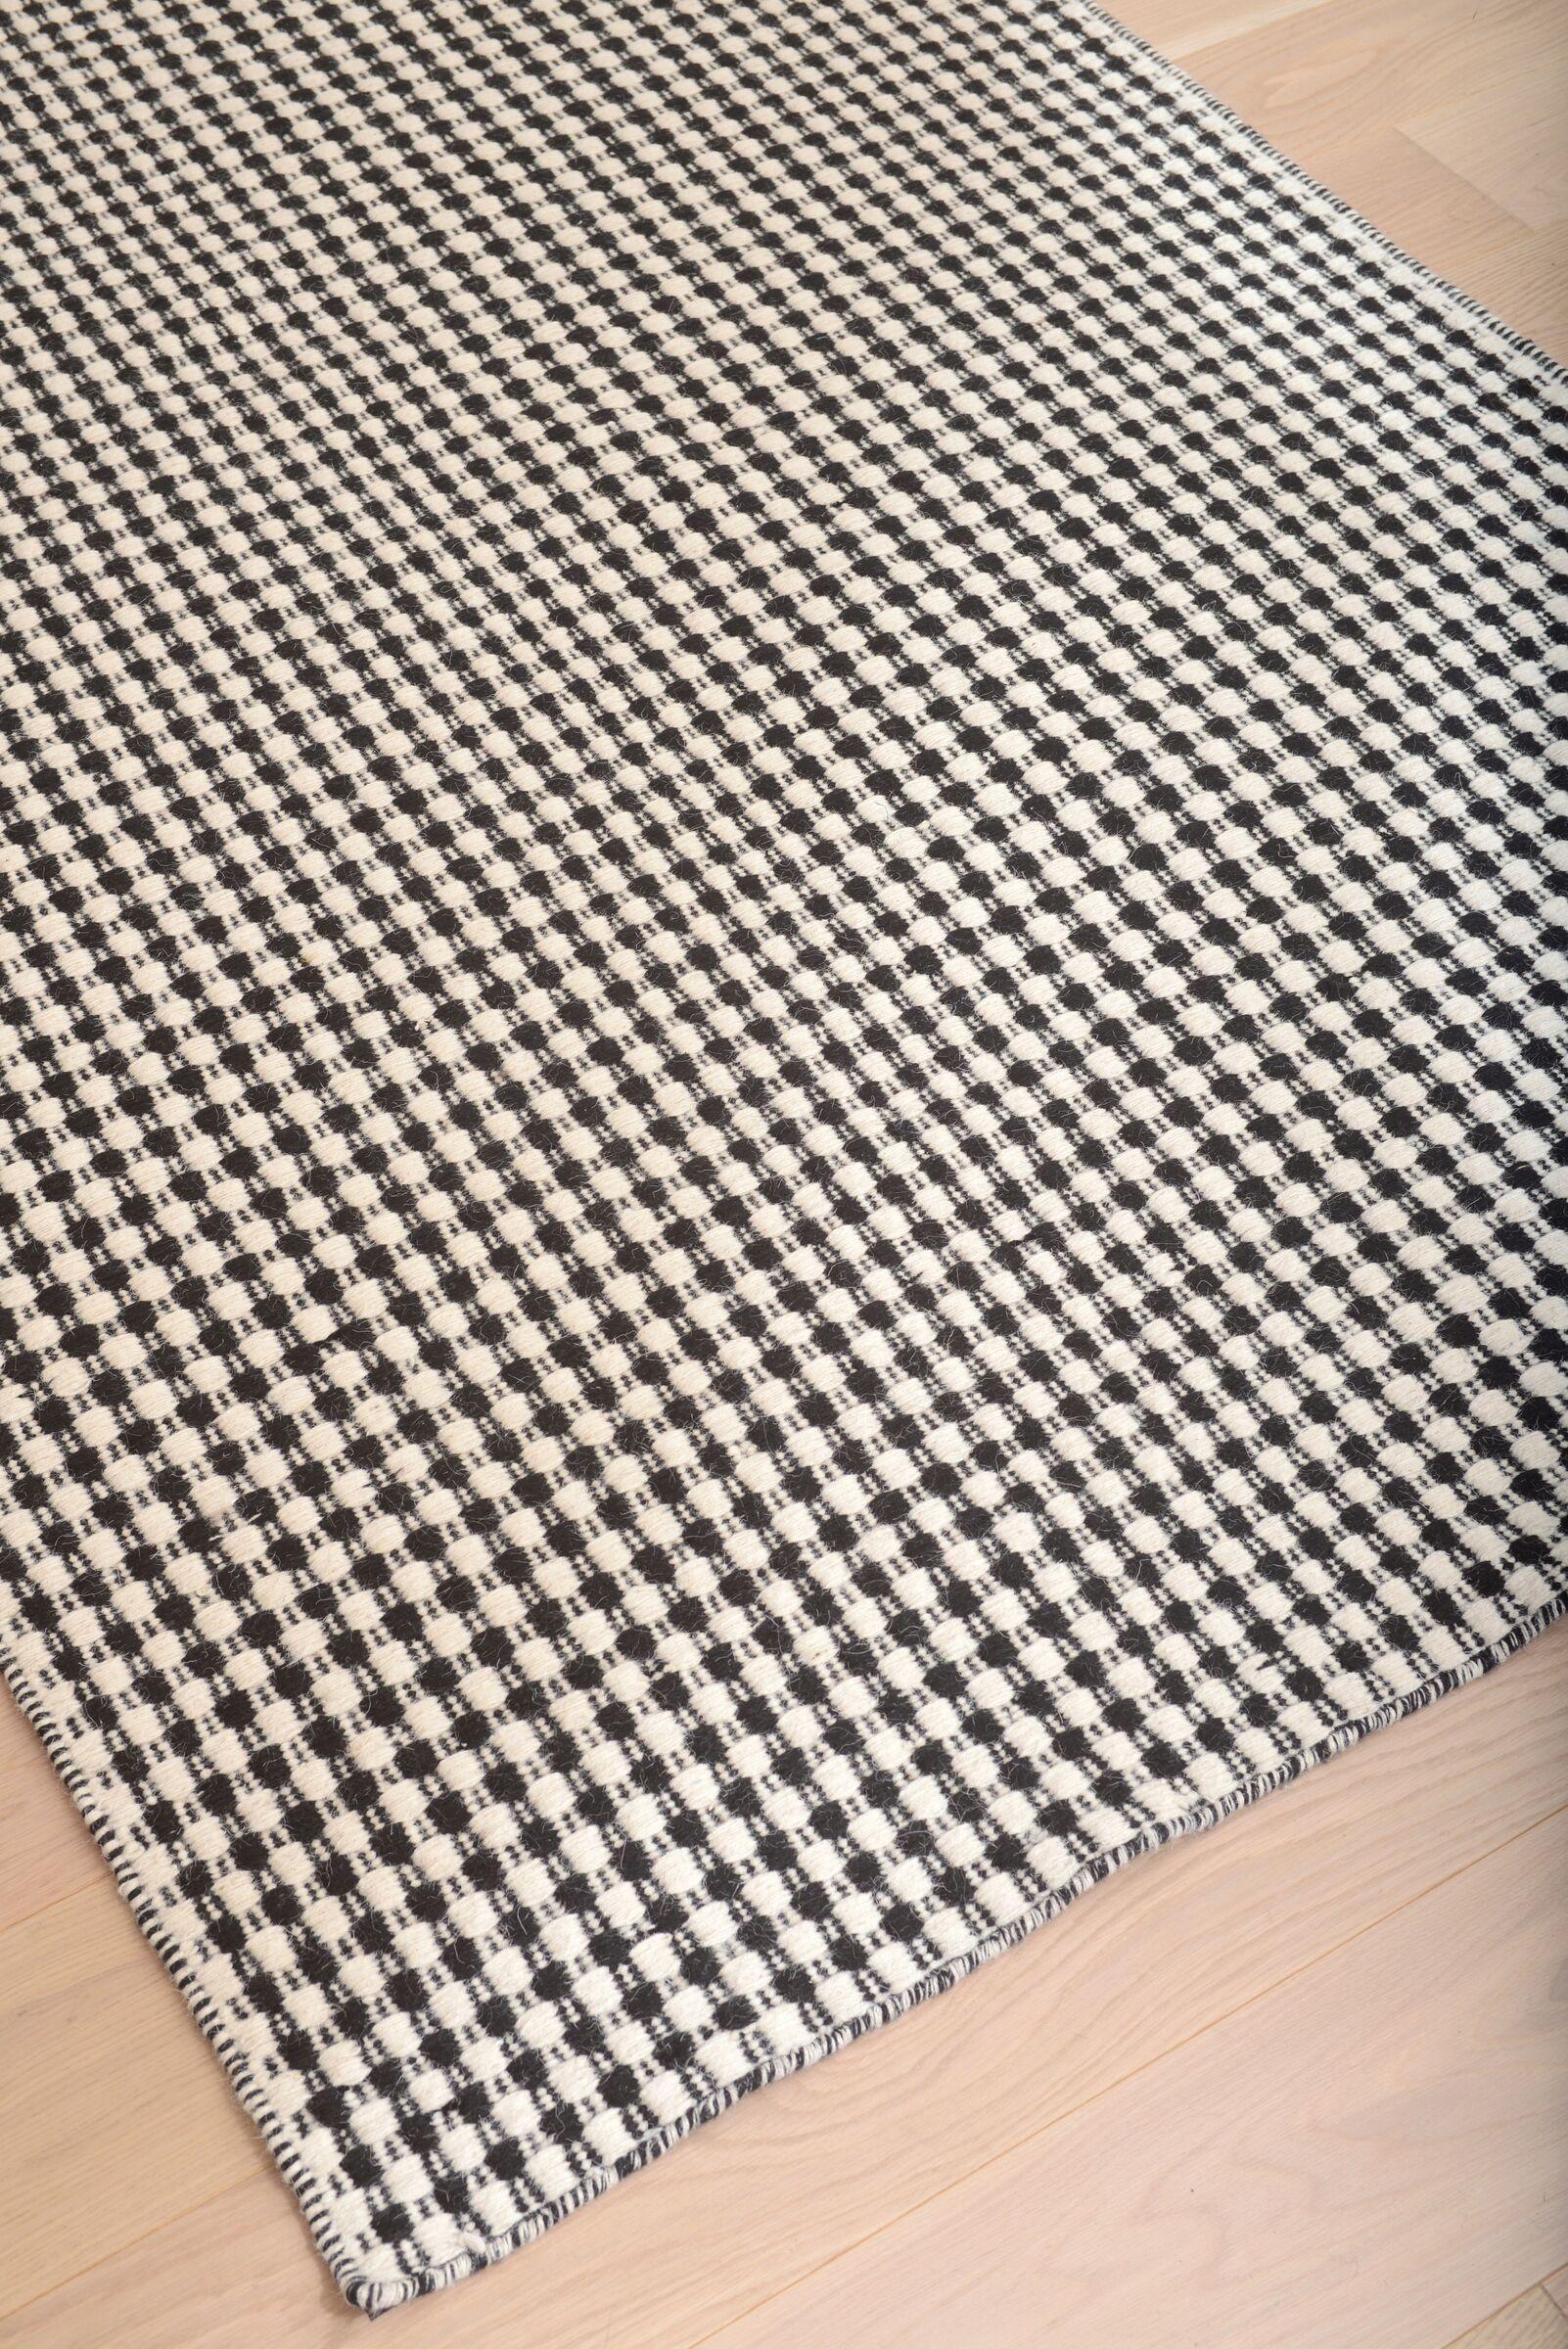 Hempstead Black/Beige Rug Rug Size: 5' x 8'